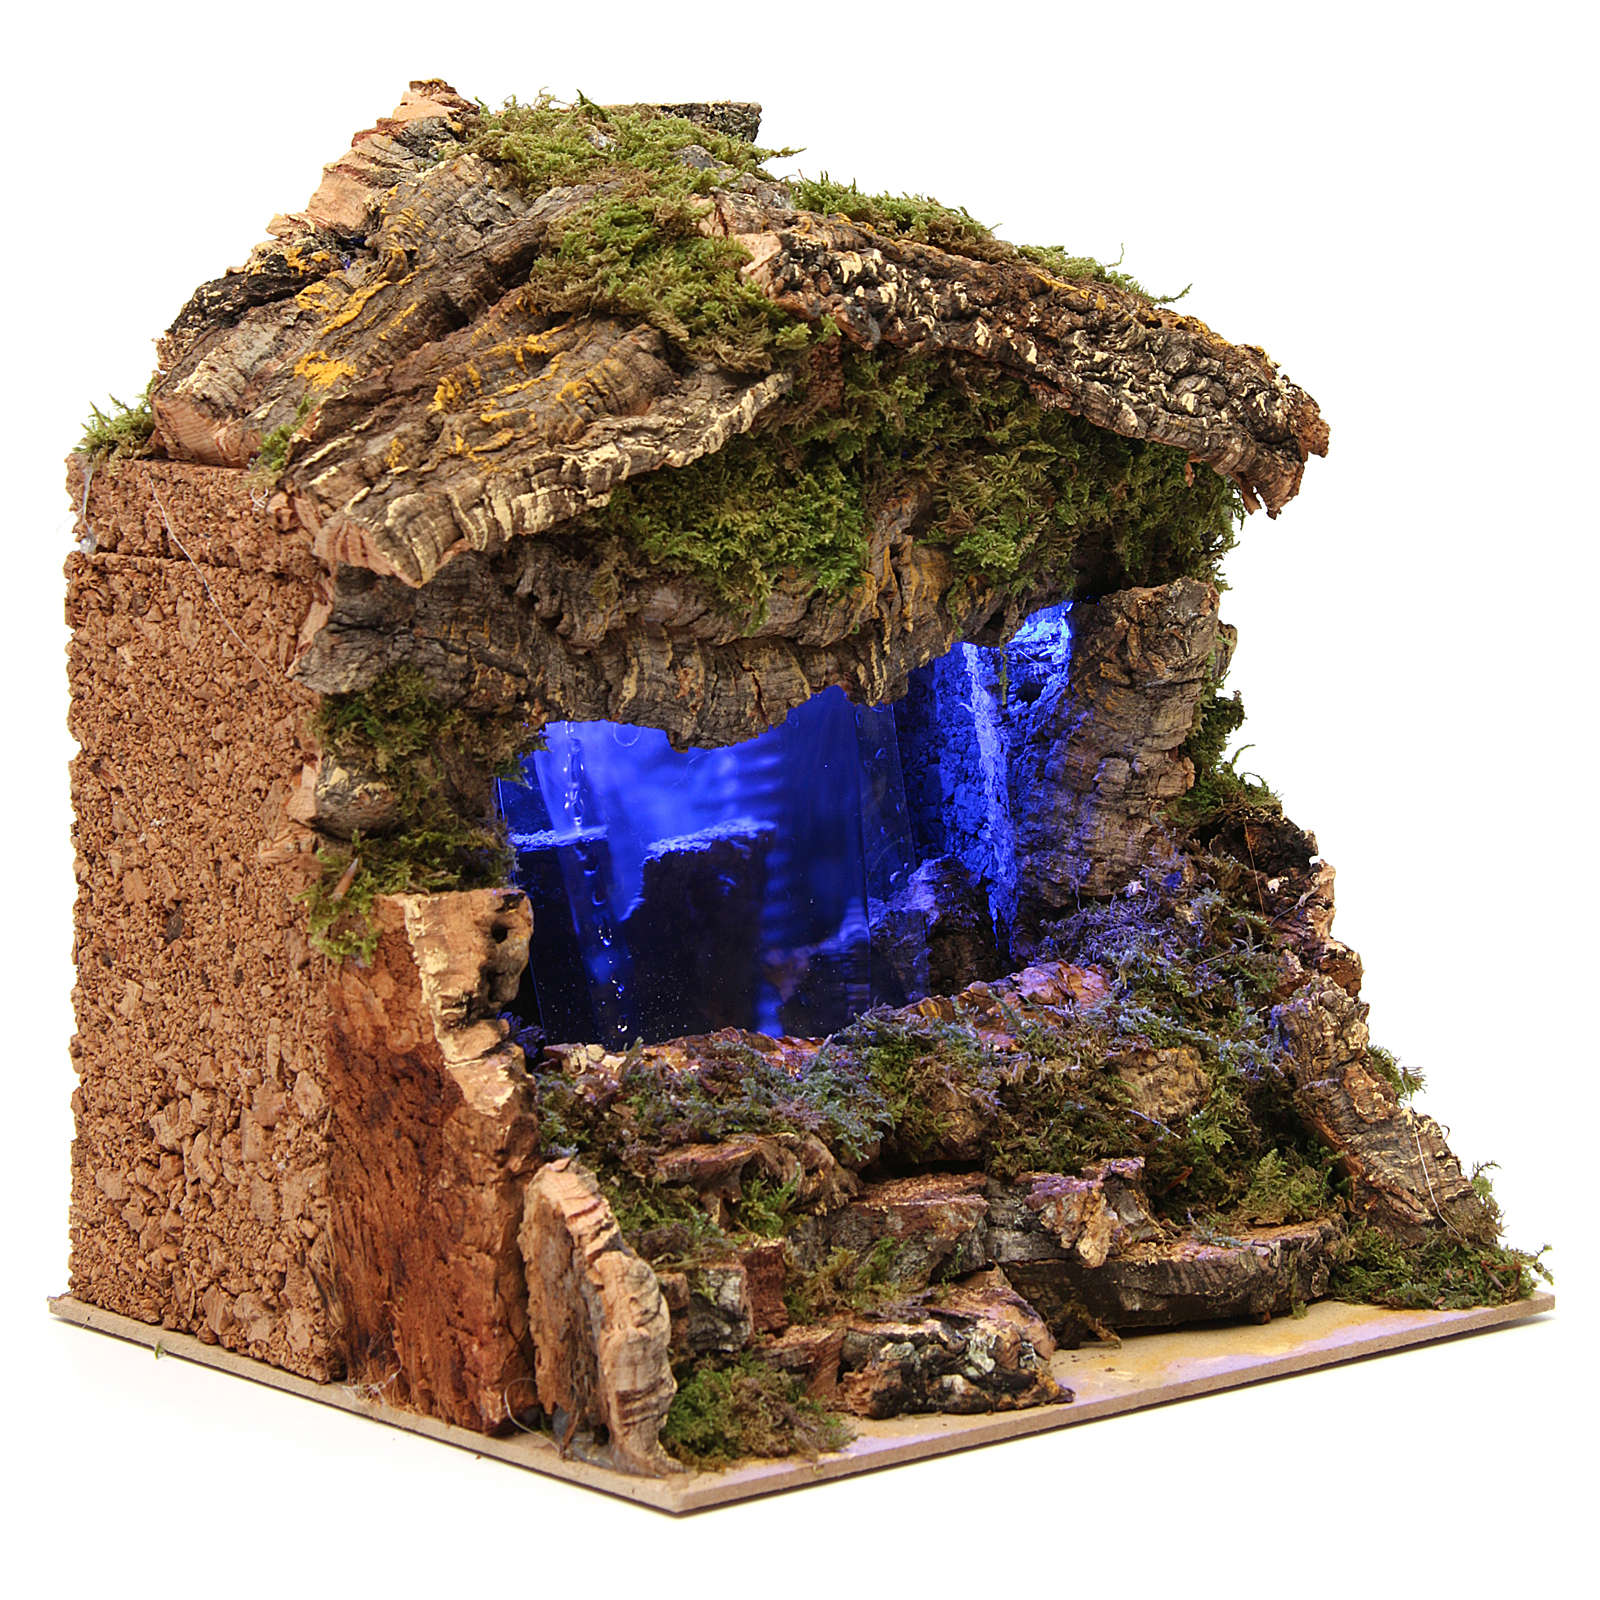 Cueva con cascada y luces 25x25x20 cm 4